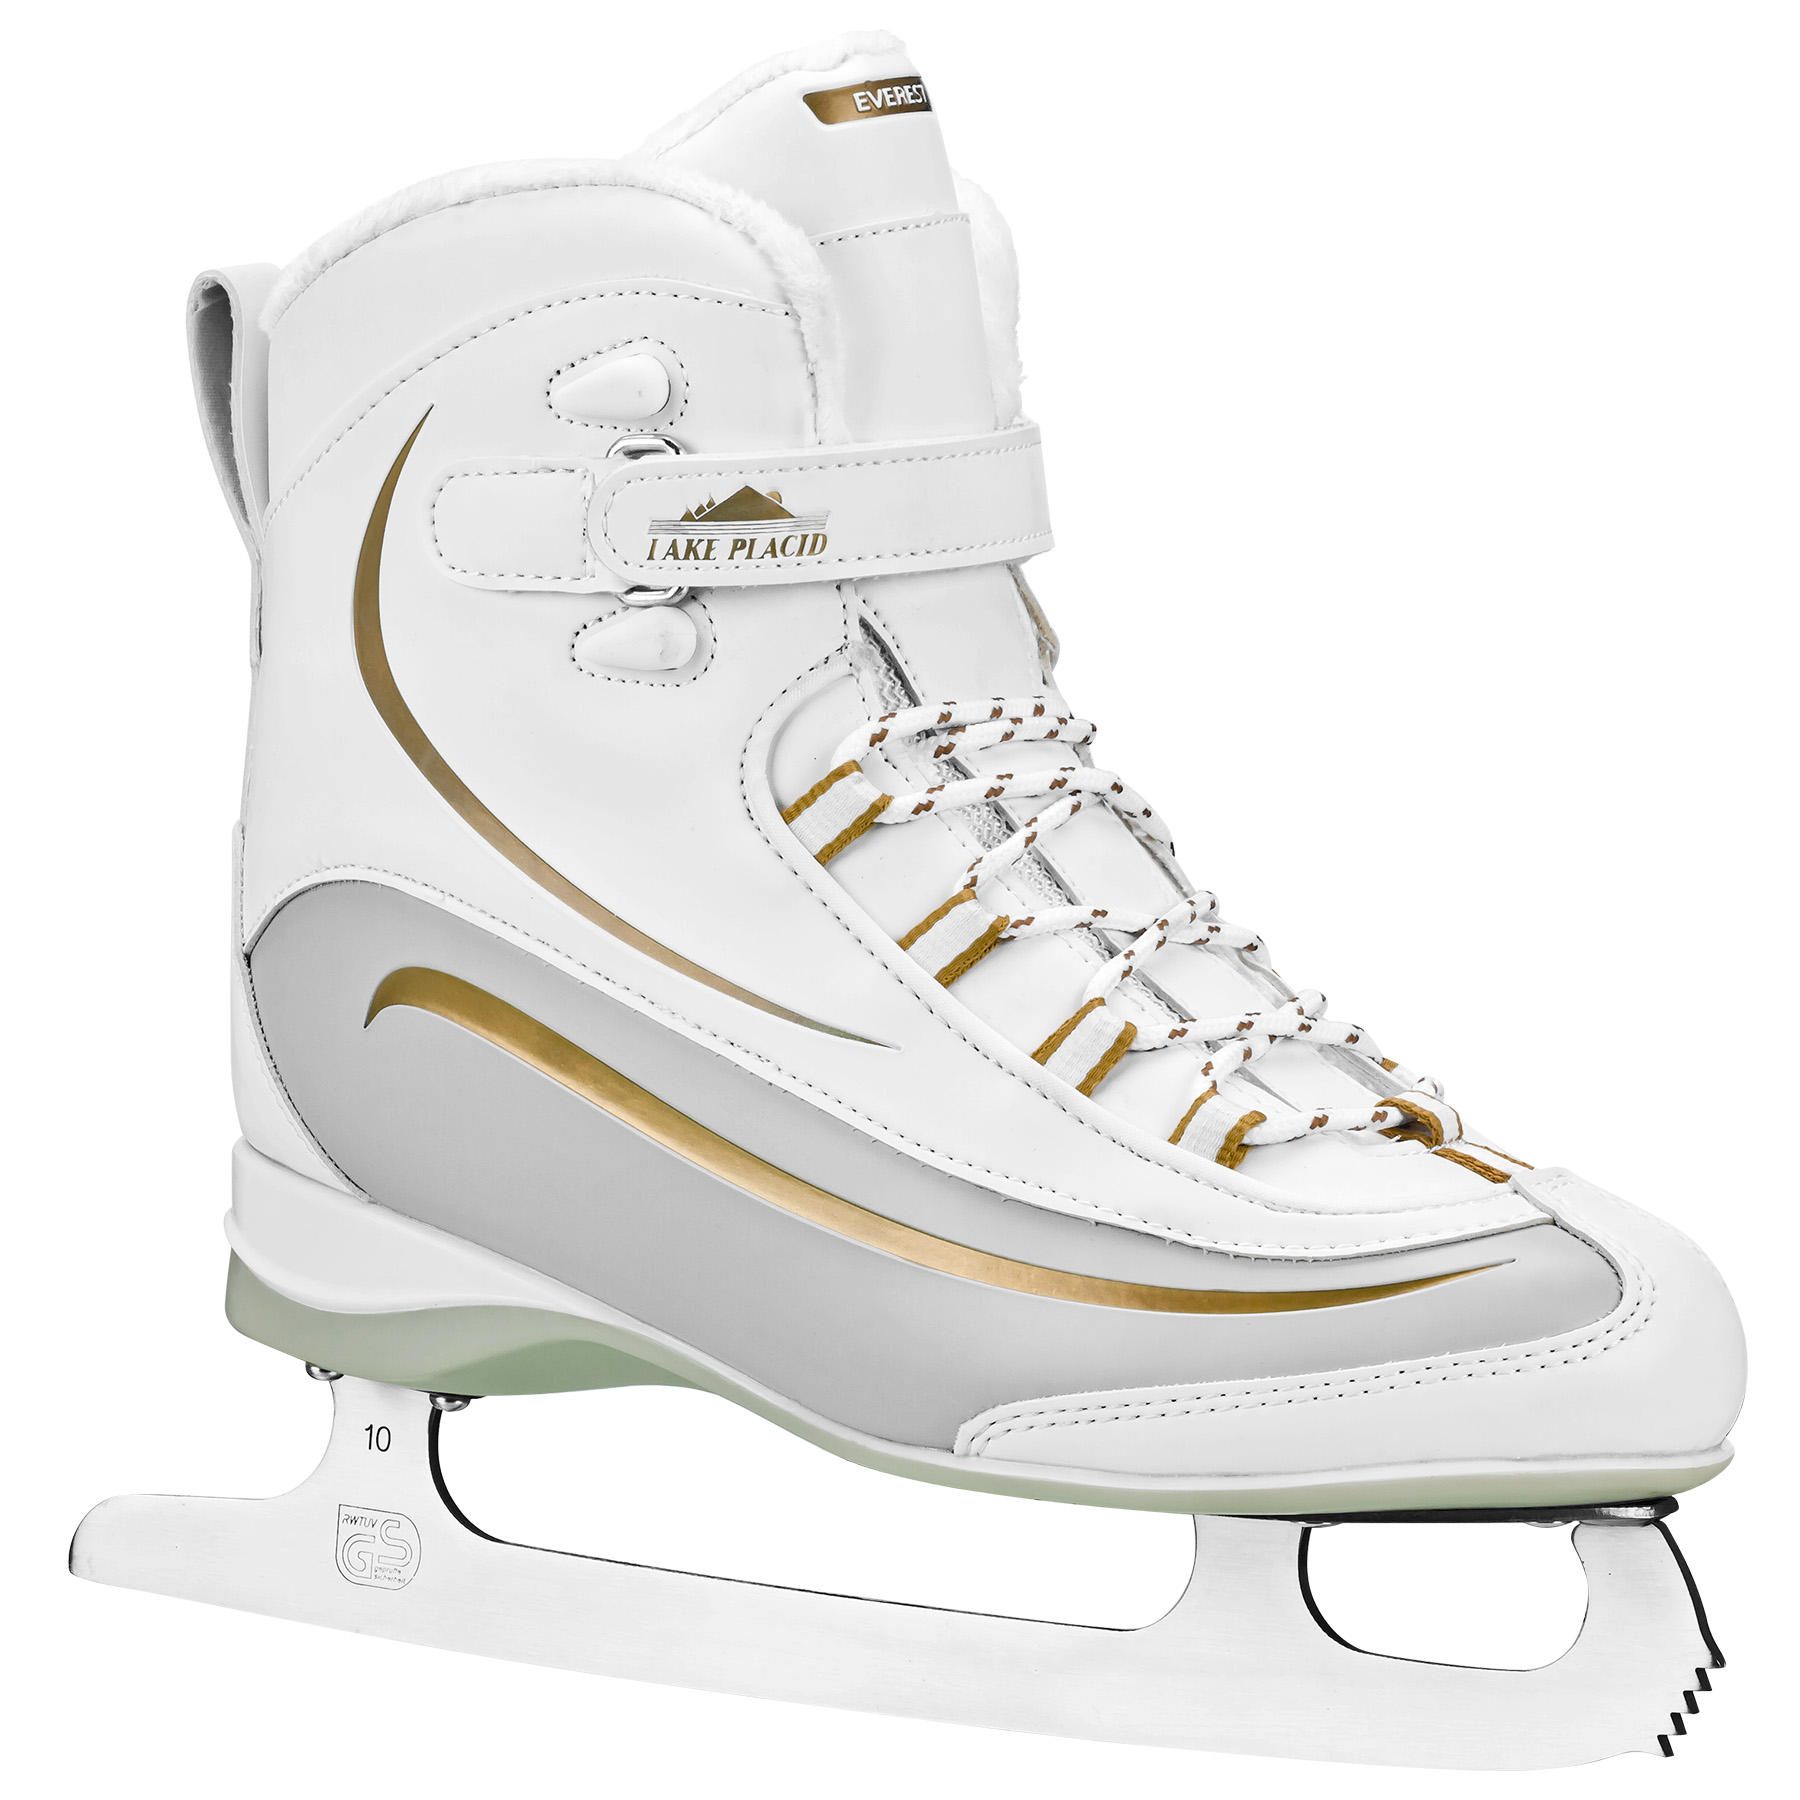 Ice Skates Figure Skating Living On The Edge Metal Vanity Tag License Plate